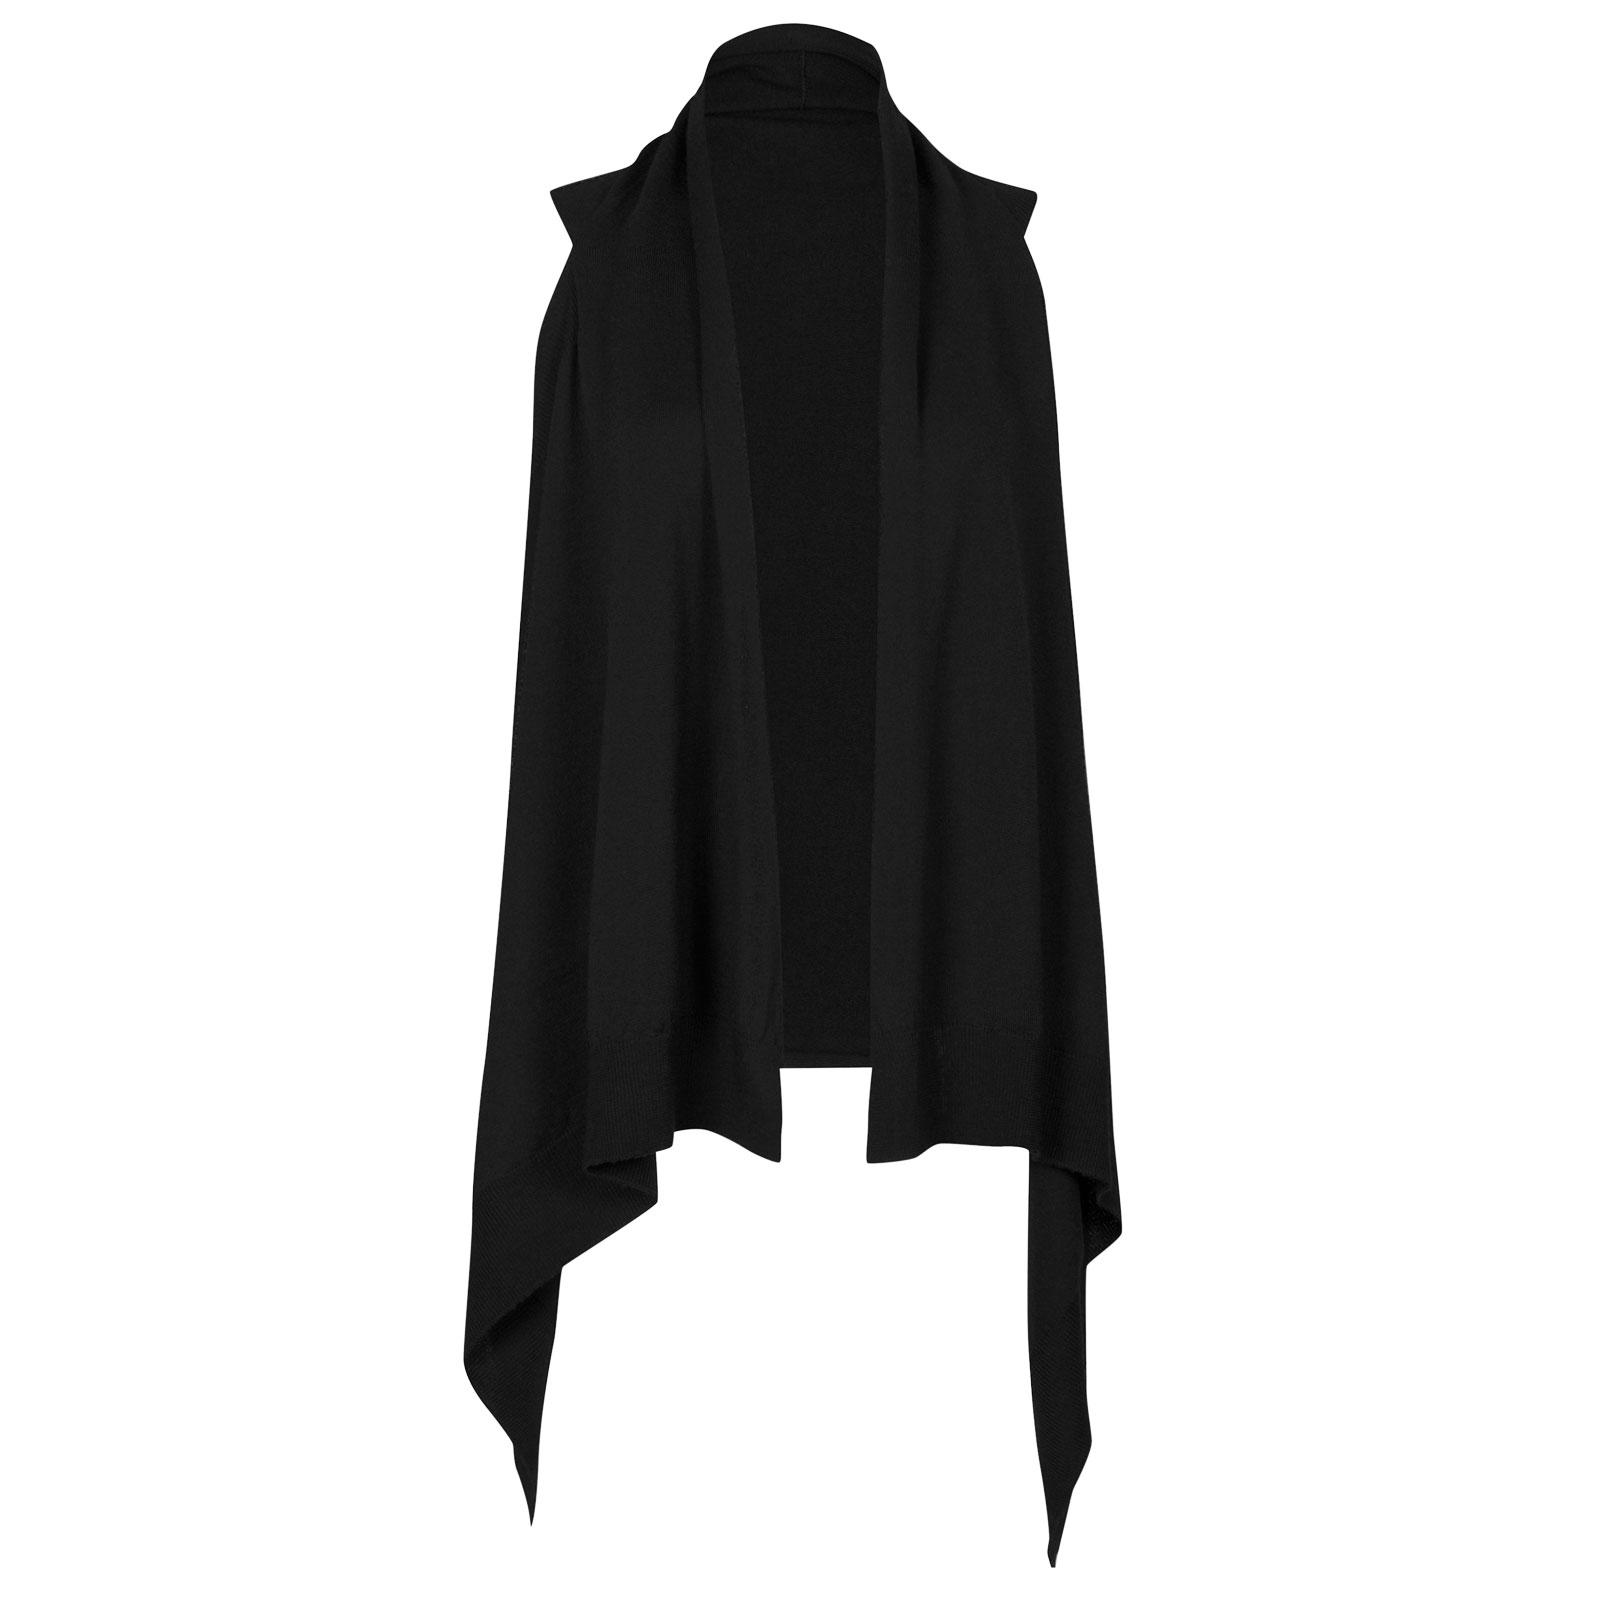 John Smedley talla Merino Wool Cardigan in Black-M